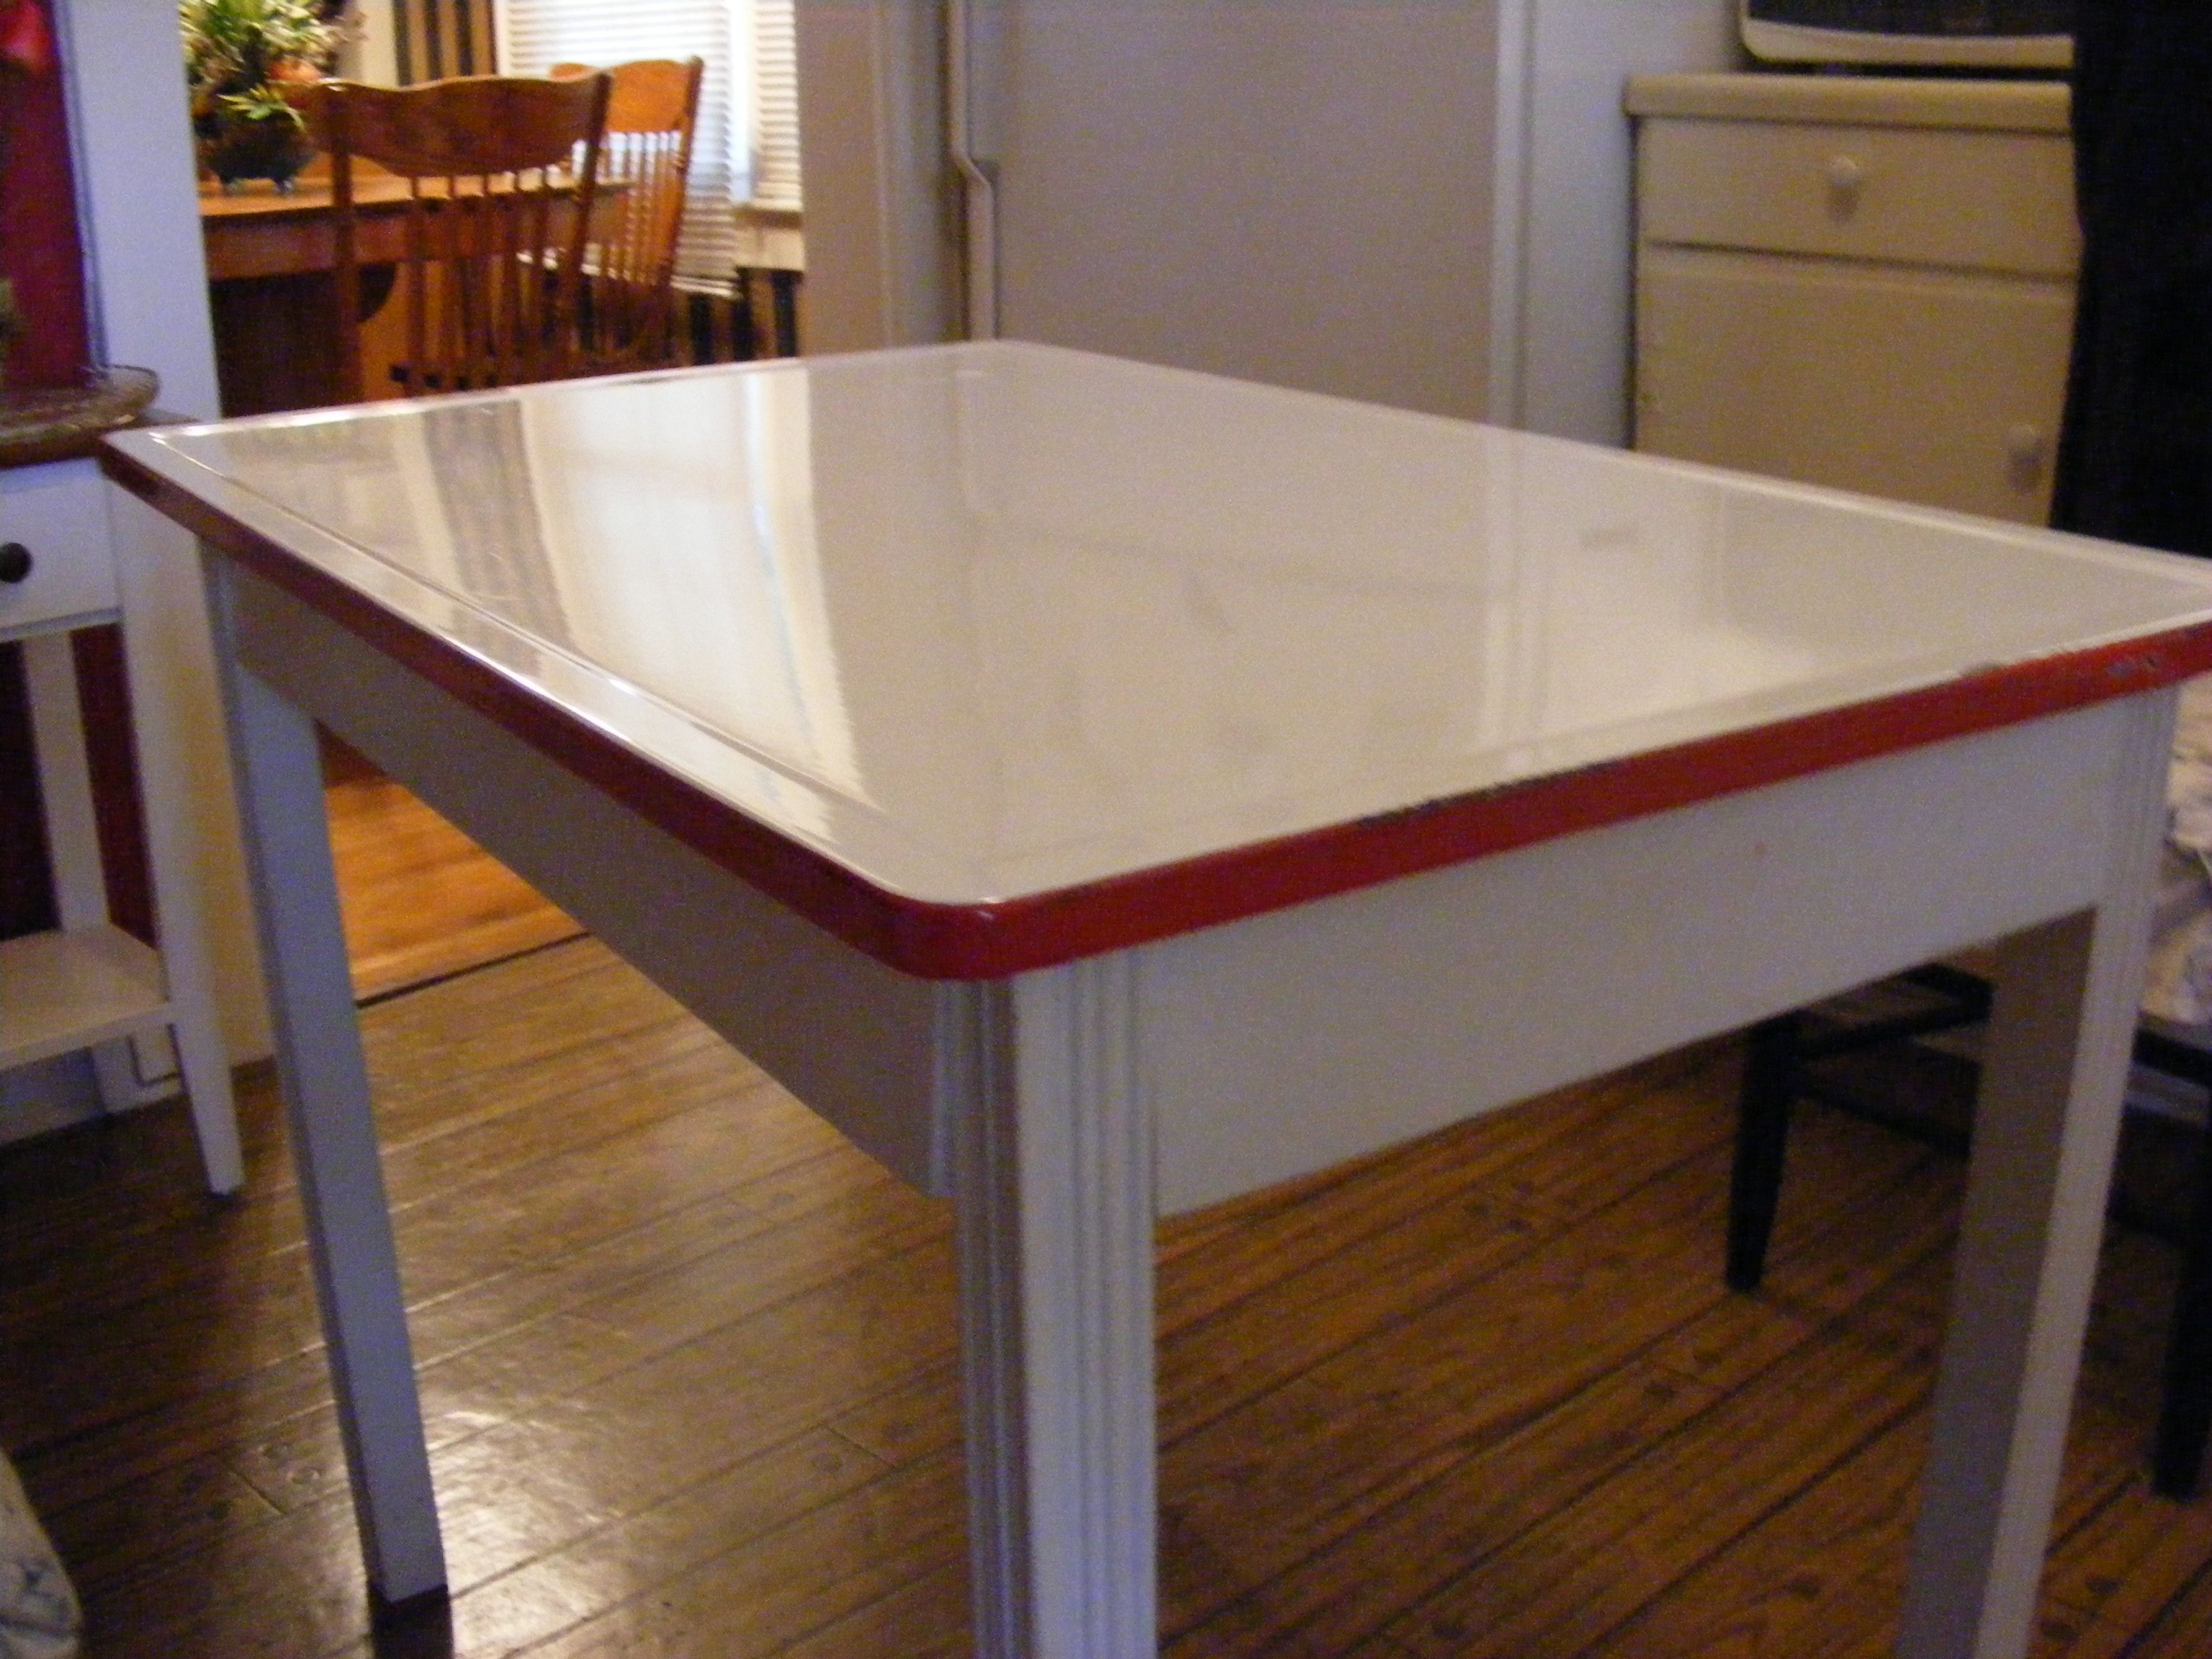 Porcelain enamel top bakers table   Bakers table, Vintage kitchen ...